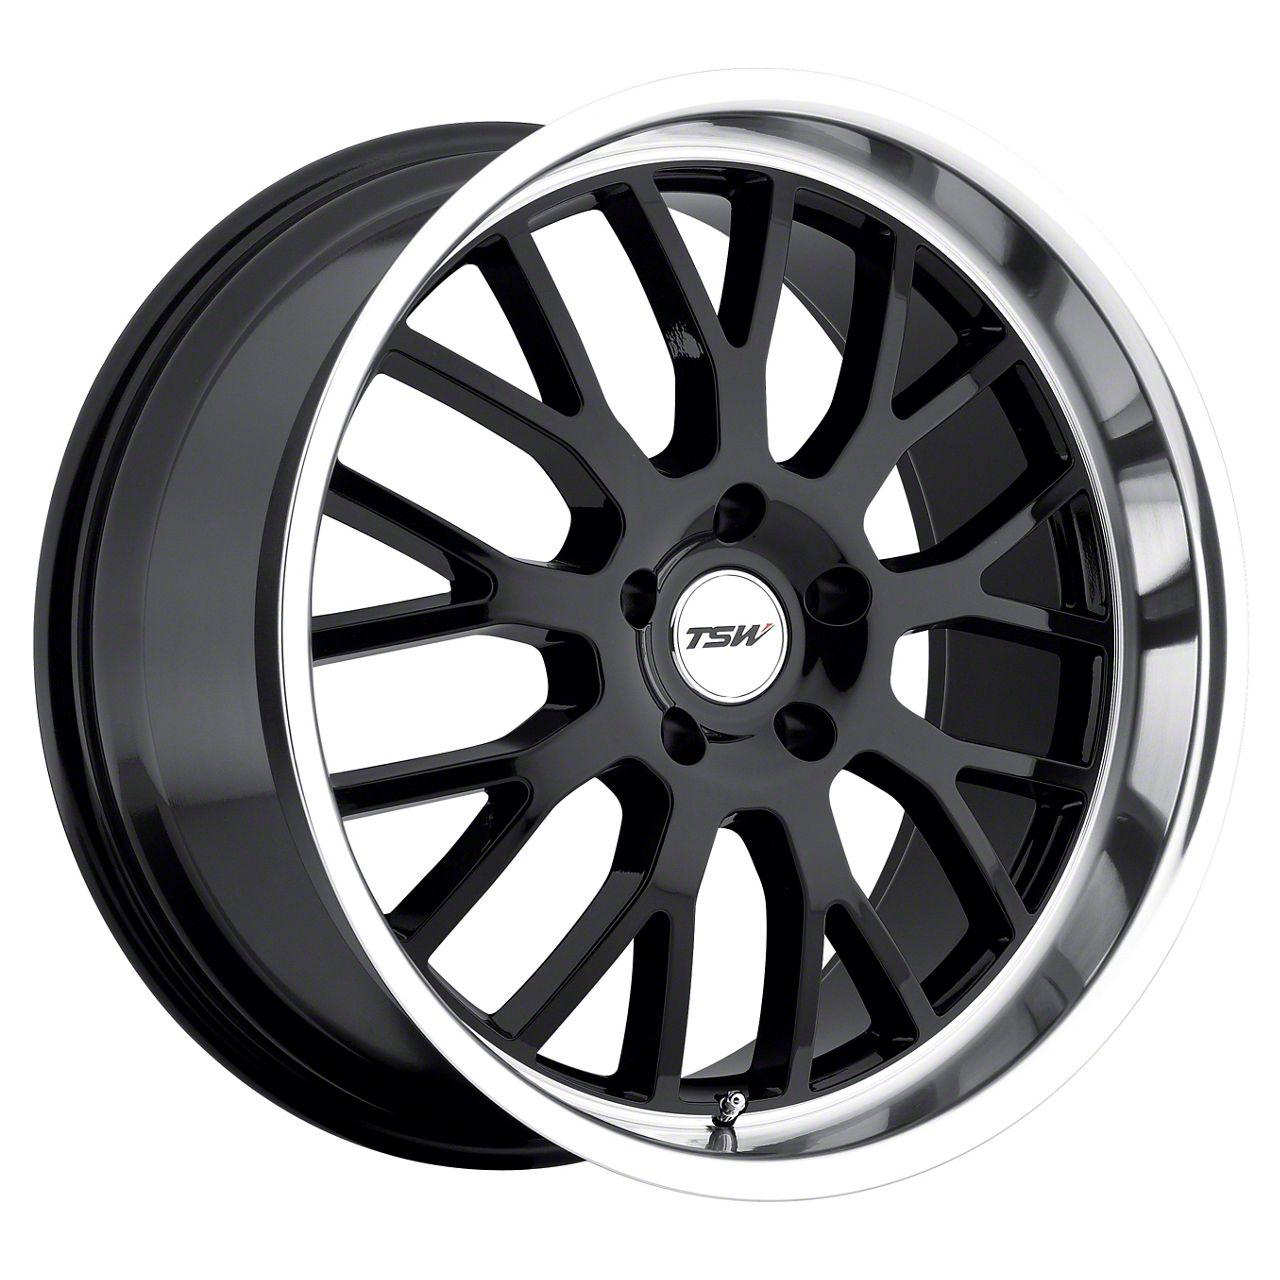 TSW Tremblant Gloss Black w/ Mirror Cut Lip Wheel - 20x10 - Rear Only (05-14 All)